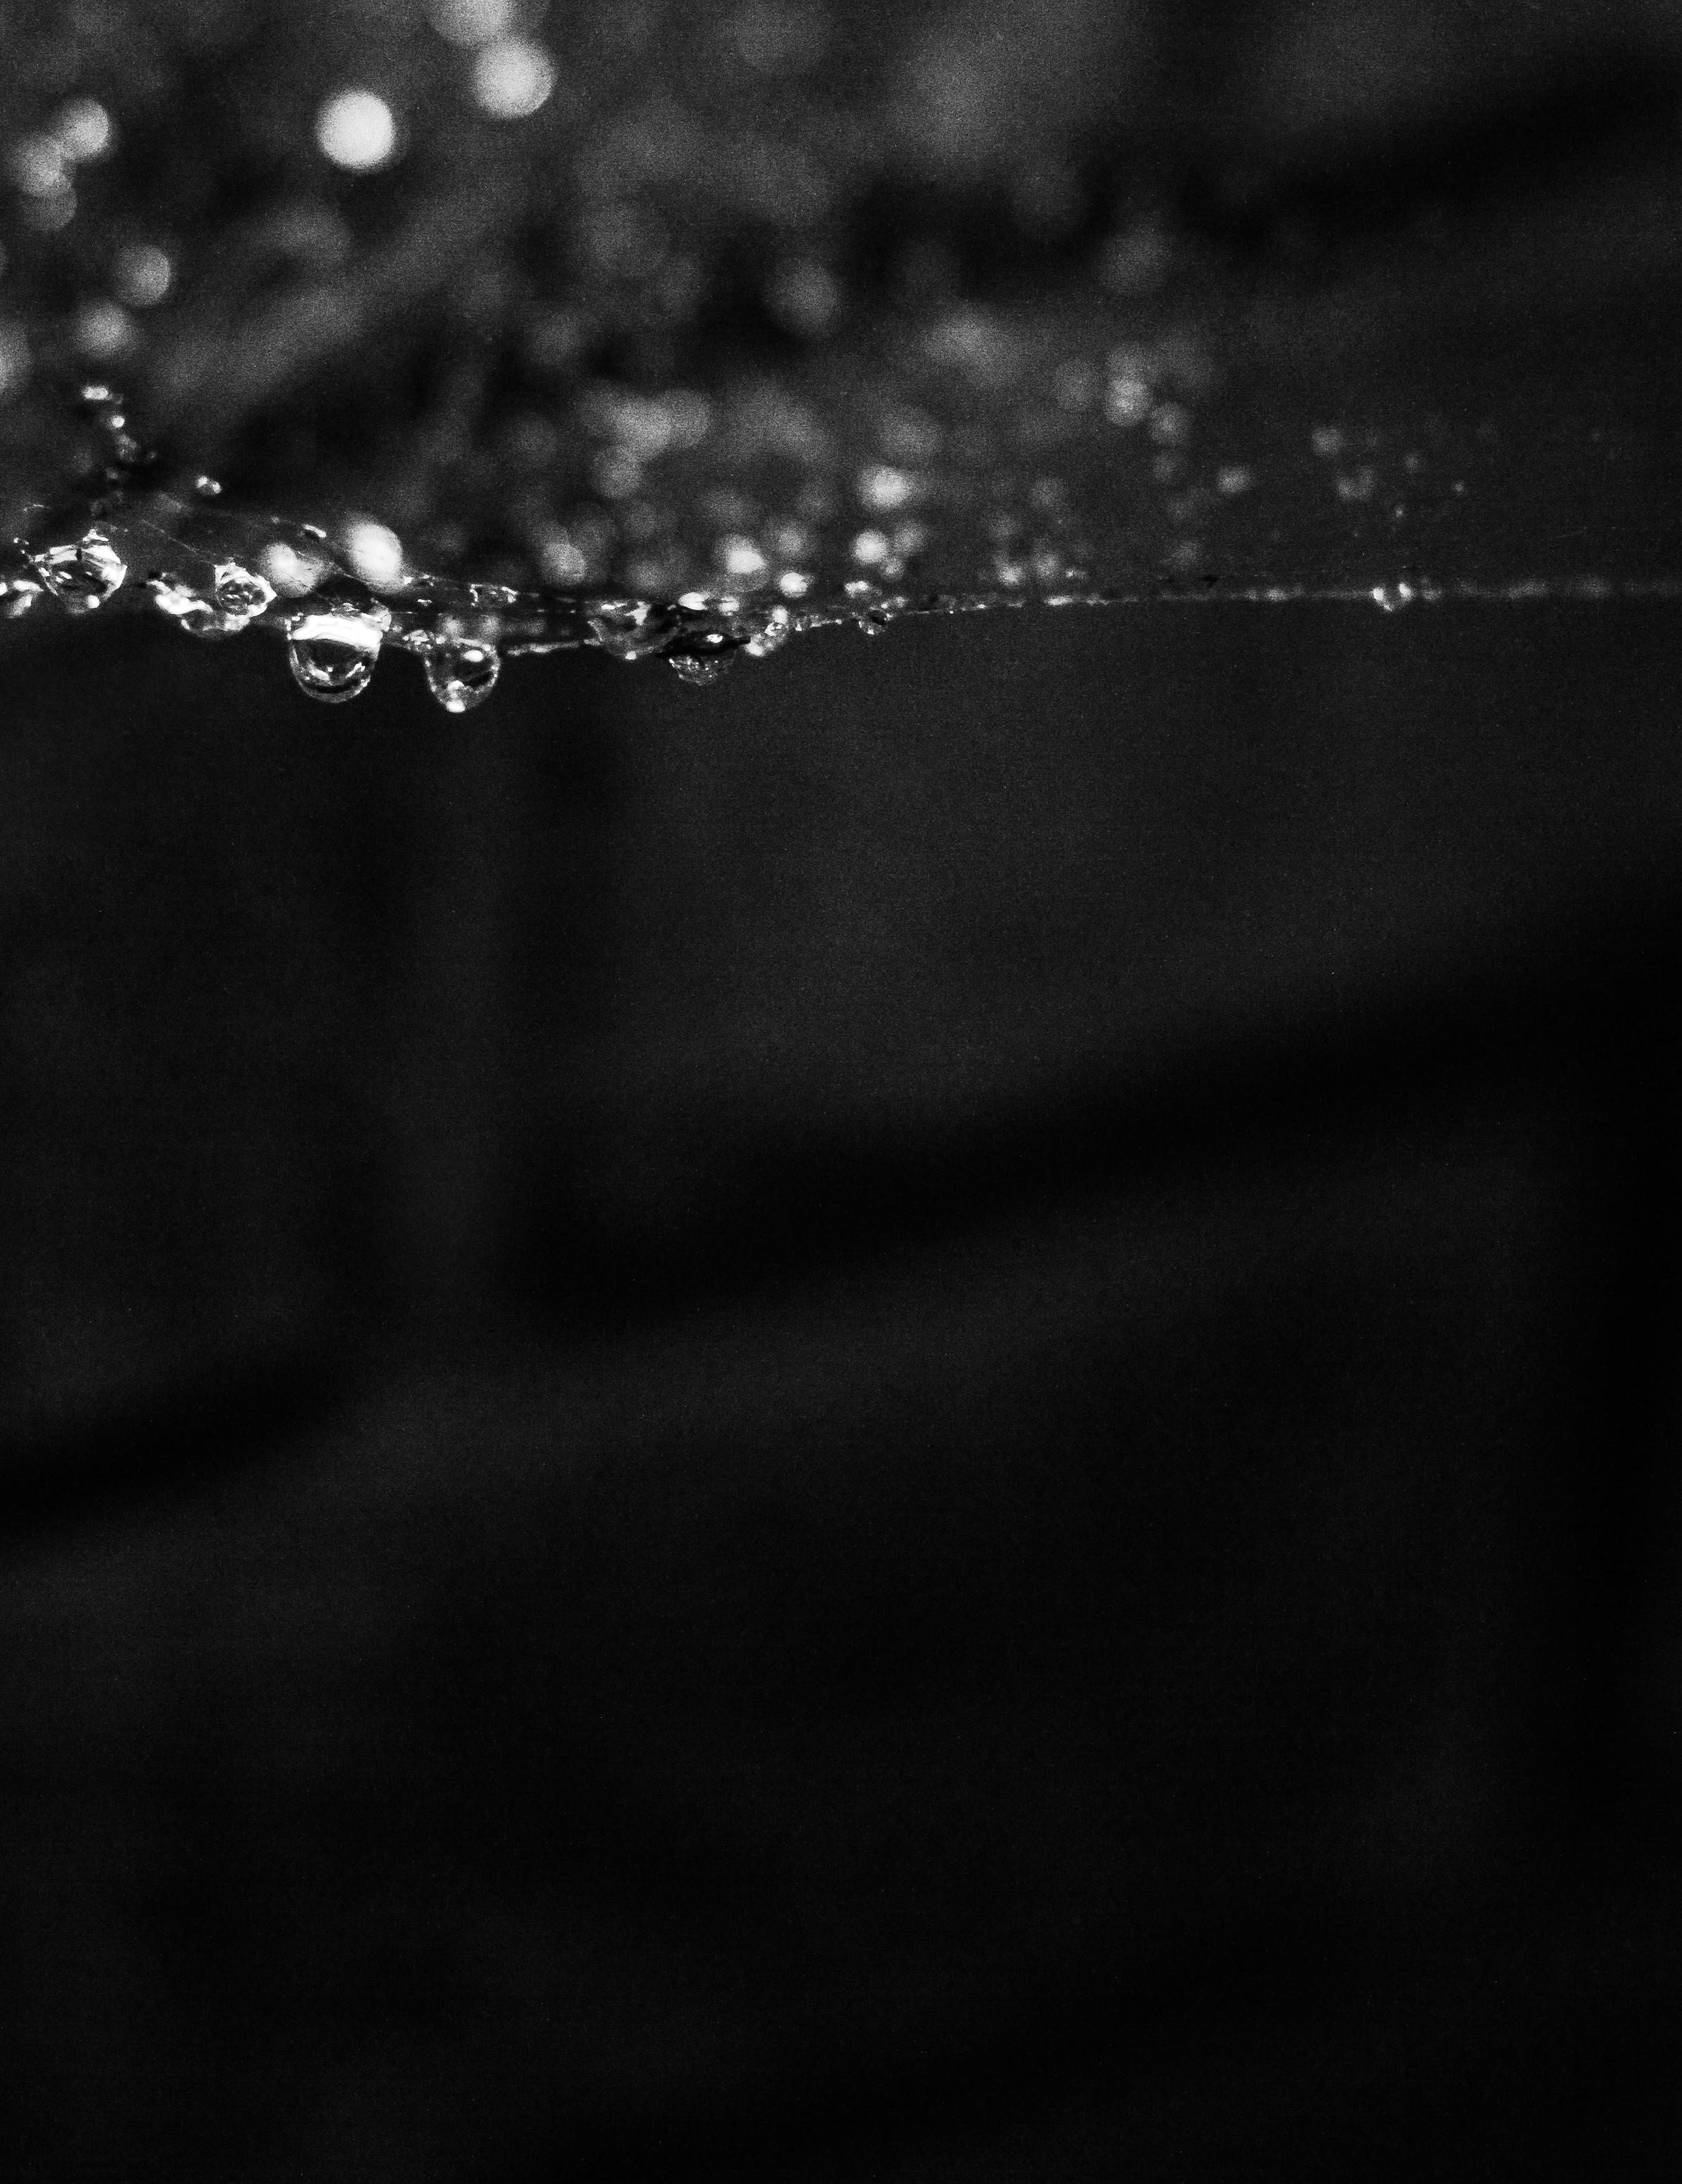 RainInstagram-4.JPG